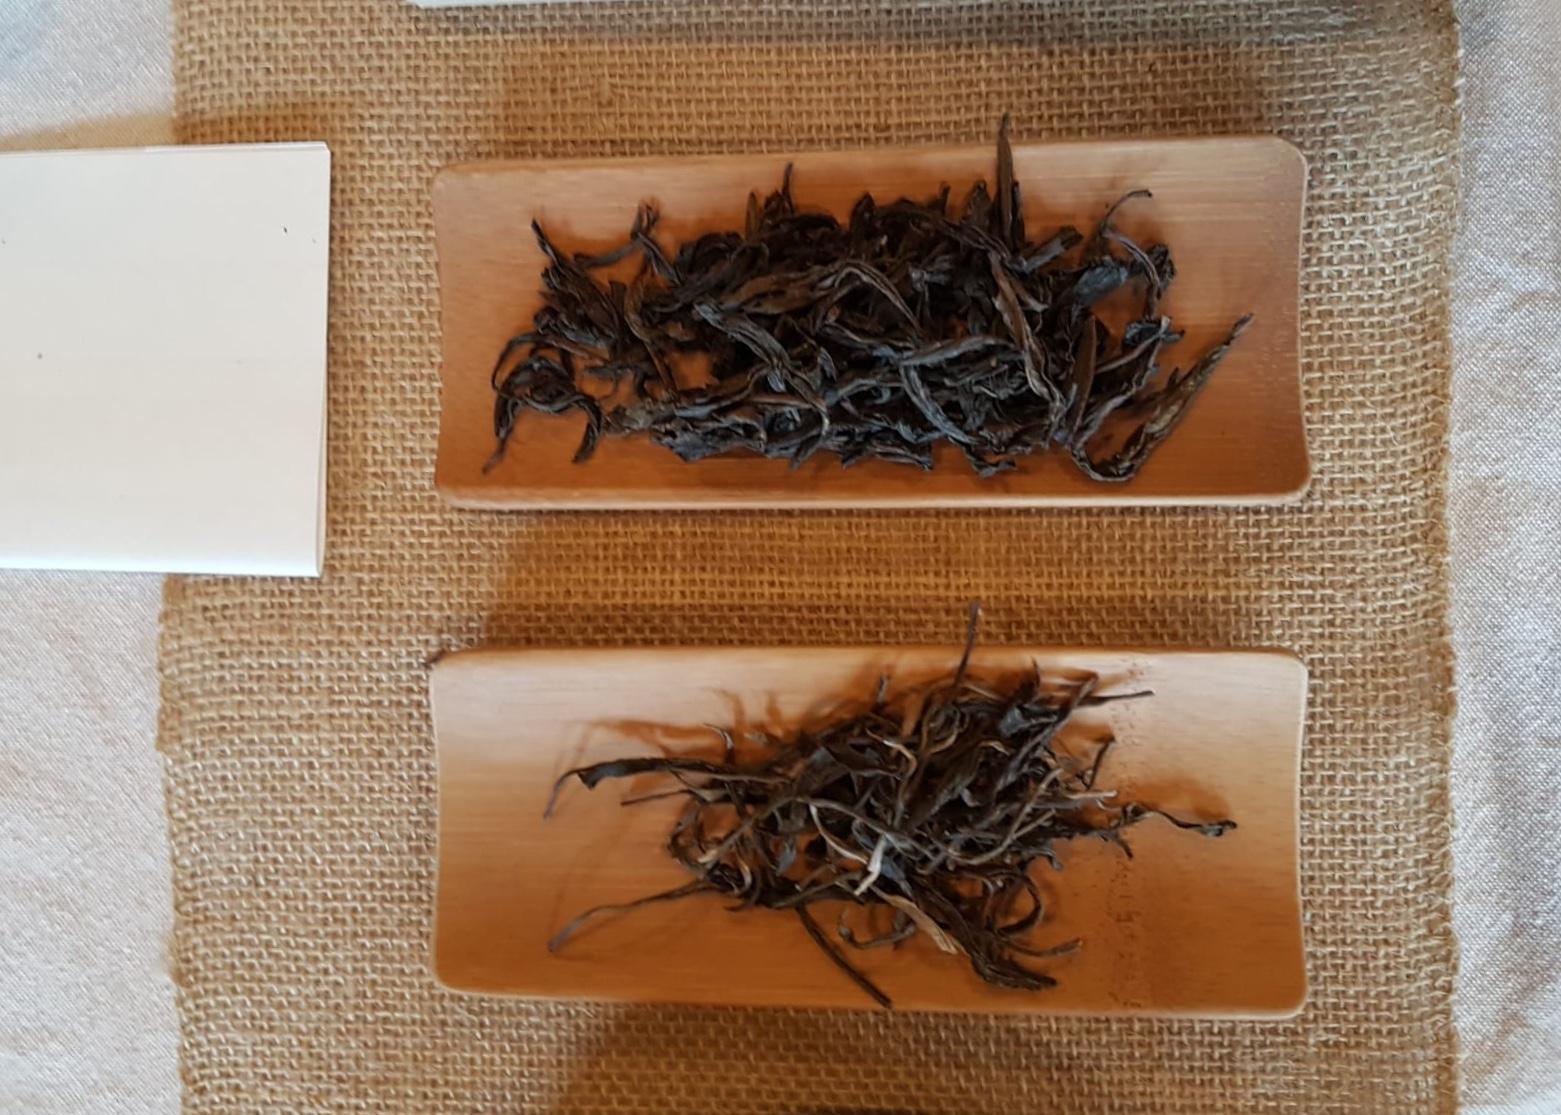 TeaXchange Dec 2018: Boil the Leaf